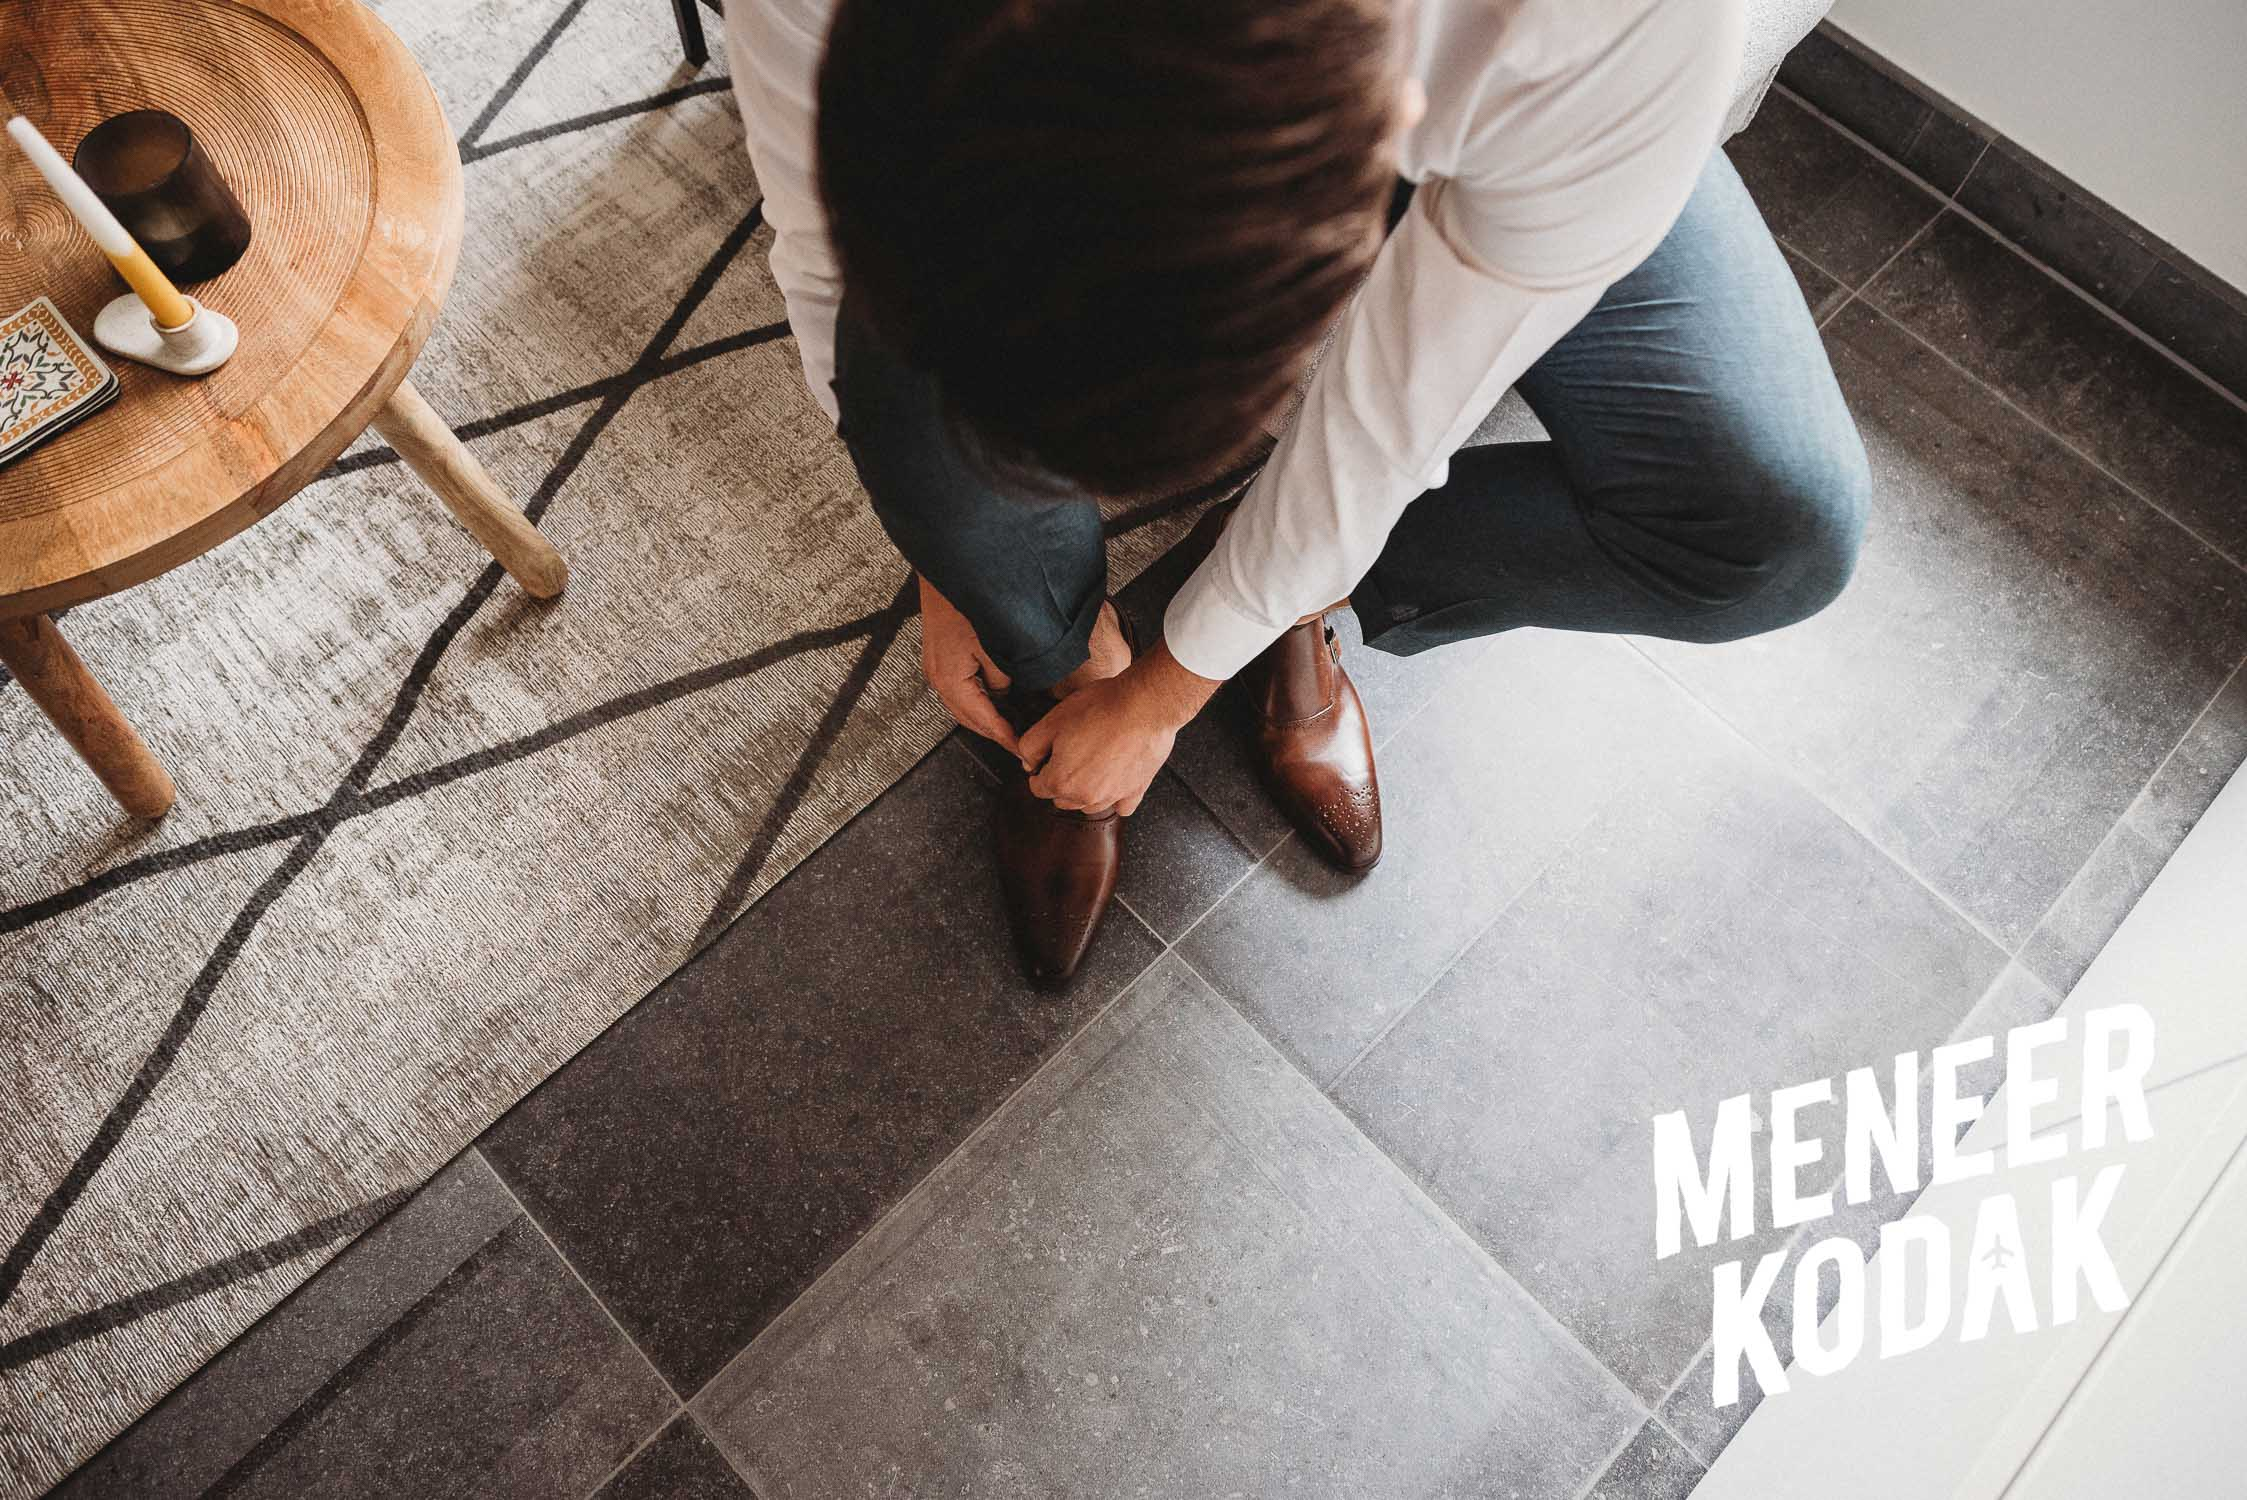 Meneer Kodak - Trouwreportage - Breda - E&M-058.jpg